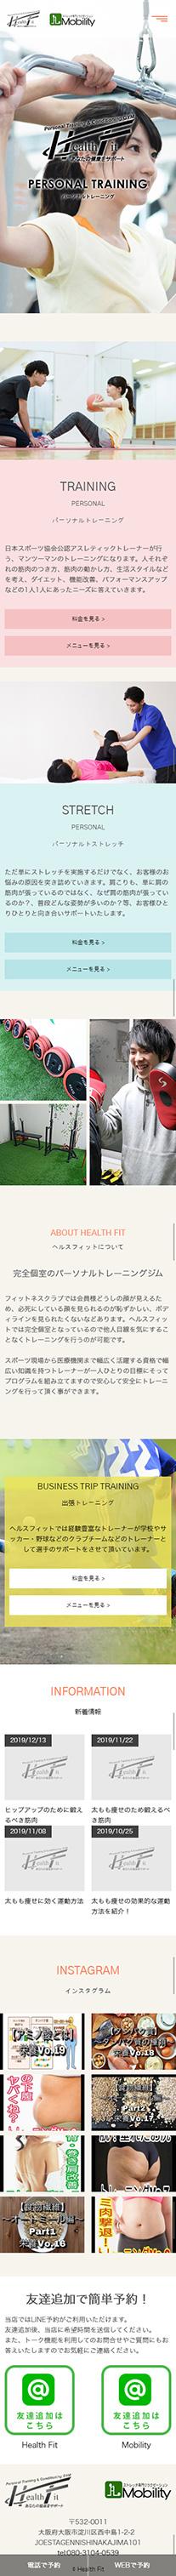 Health FitスマホTOP画像